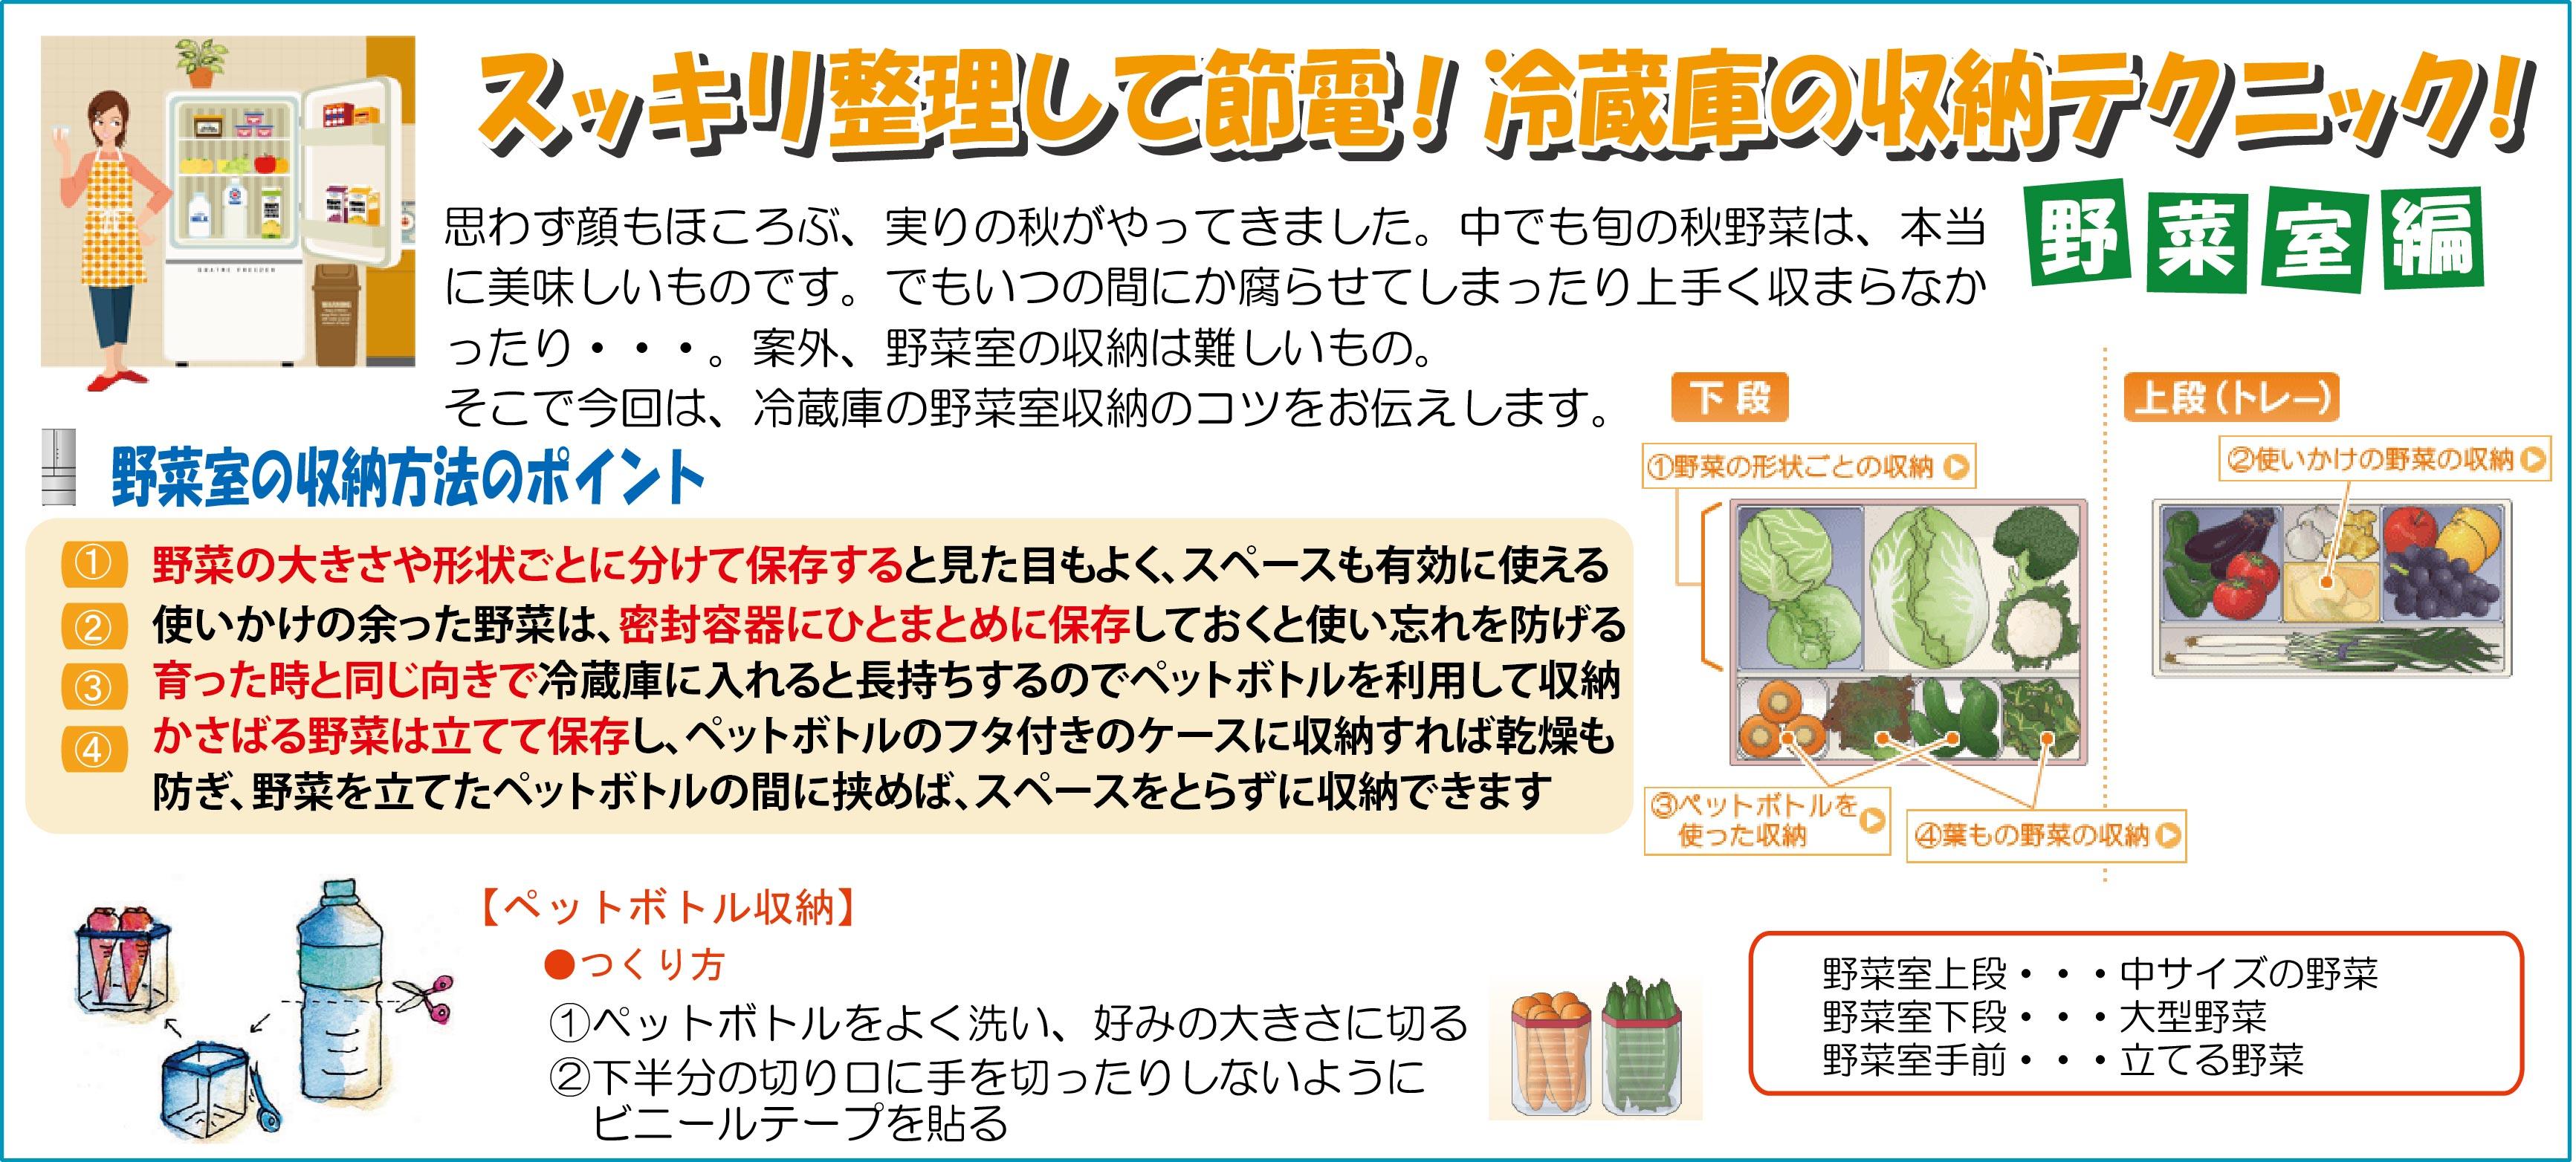 KuraSi-natu-sin89-15.jpg